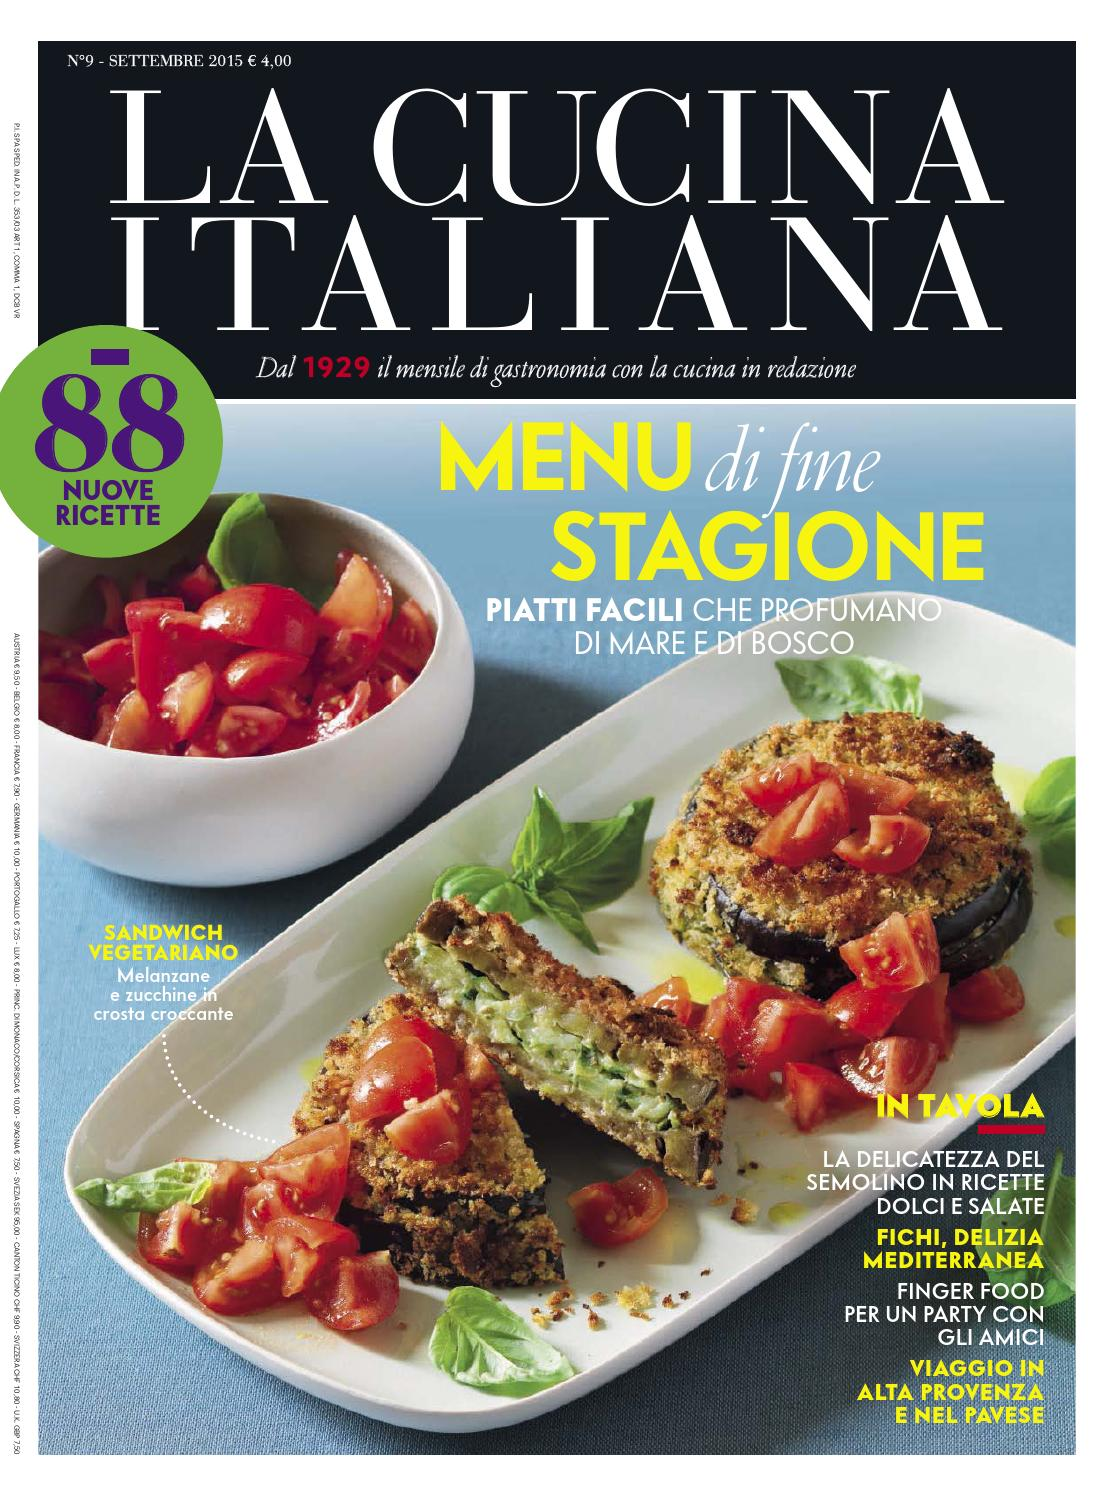 La Cucina Italiana Settembre 2015 By Melik Issuu